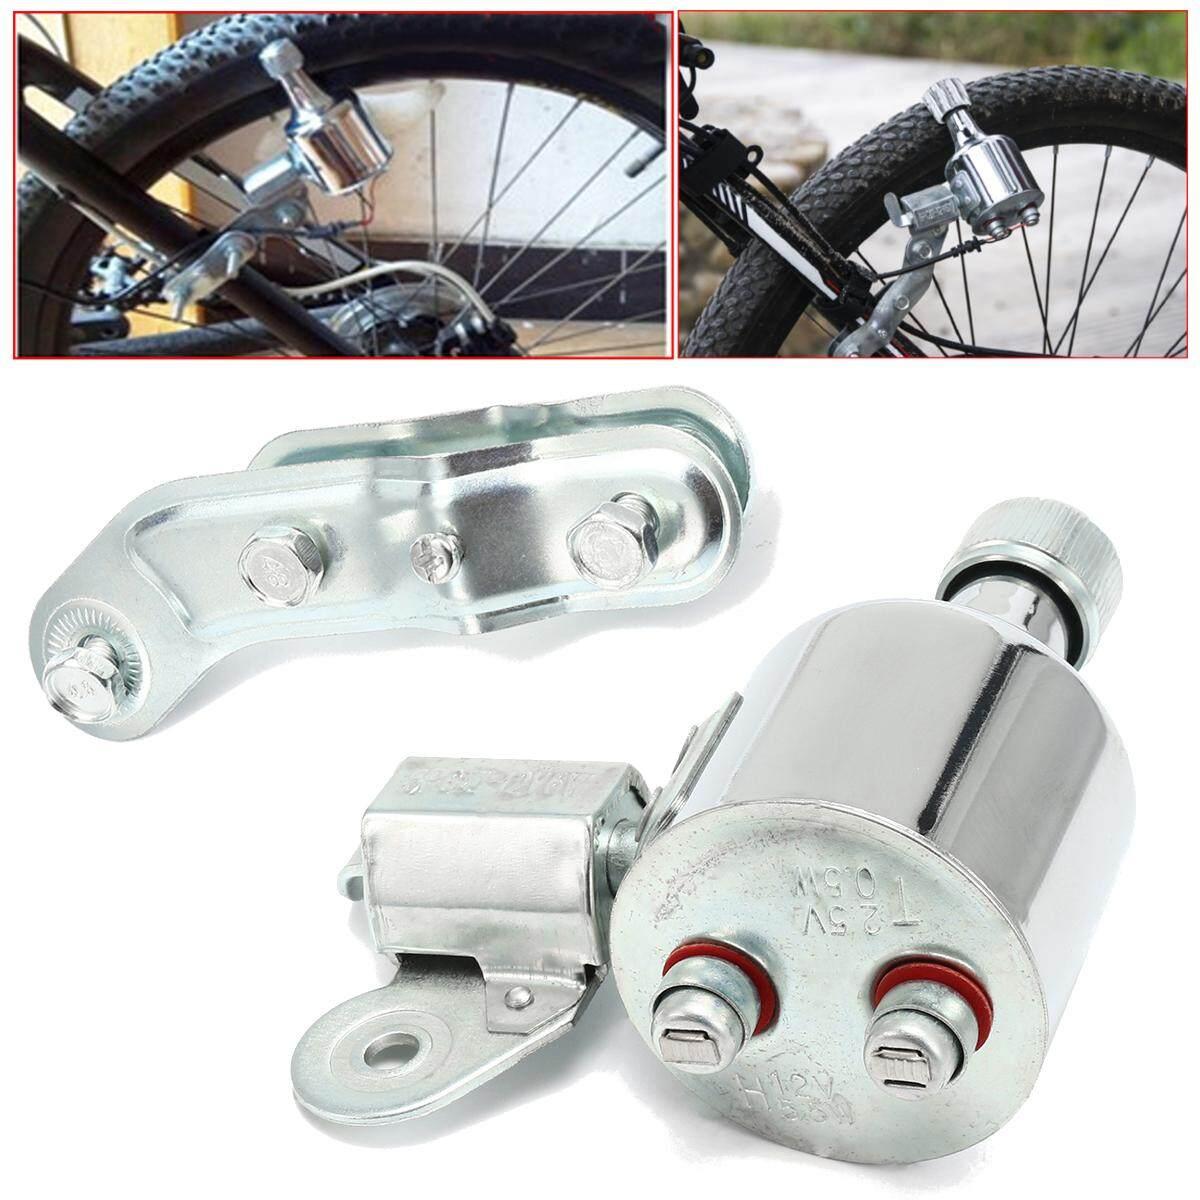 New Bicycle Light Generator 12V 6W Dynamo Motorized Friction Head Rear Light Kit